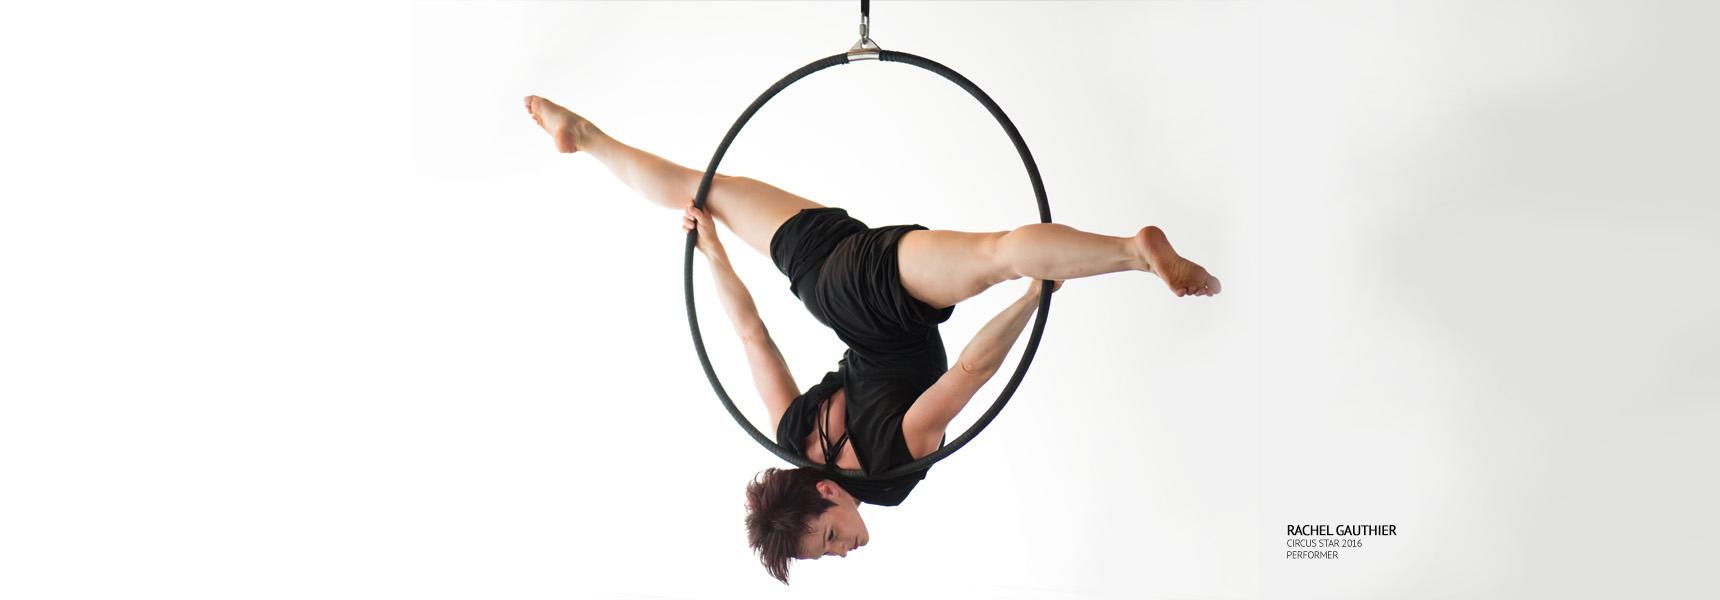 Rachel Gauthier, Circus Star USA 2016 performer